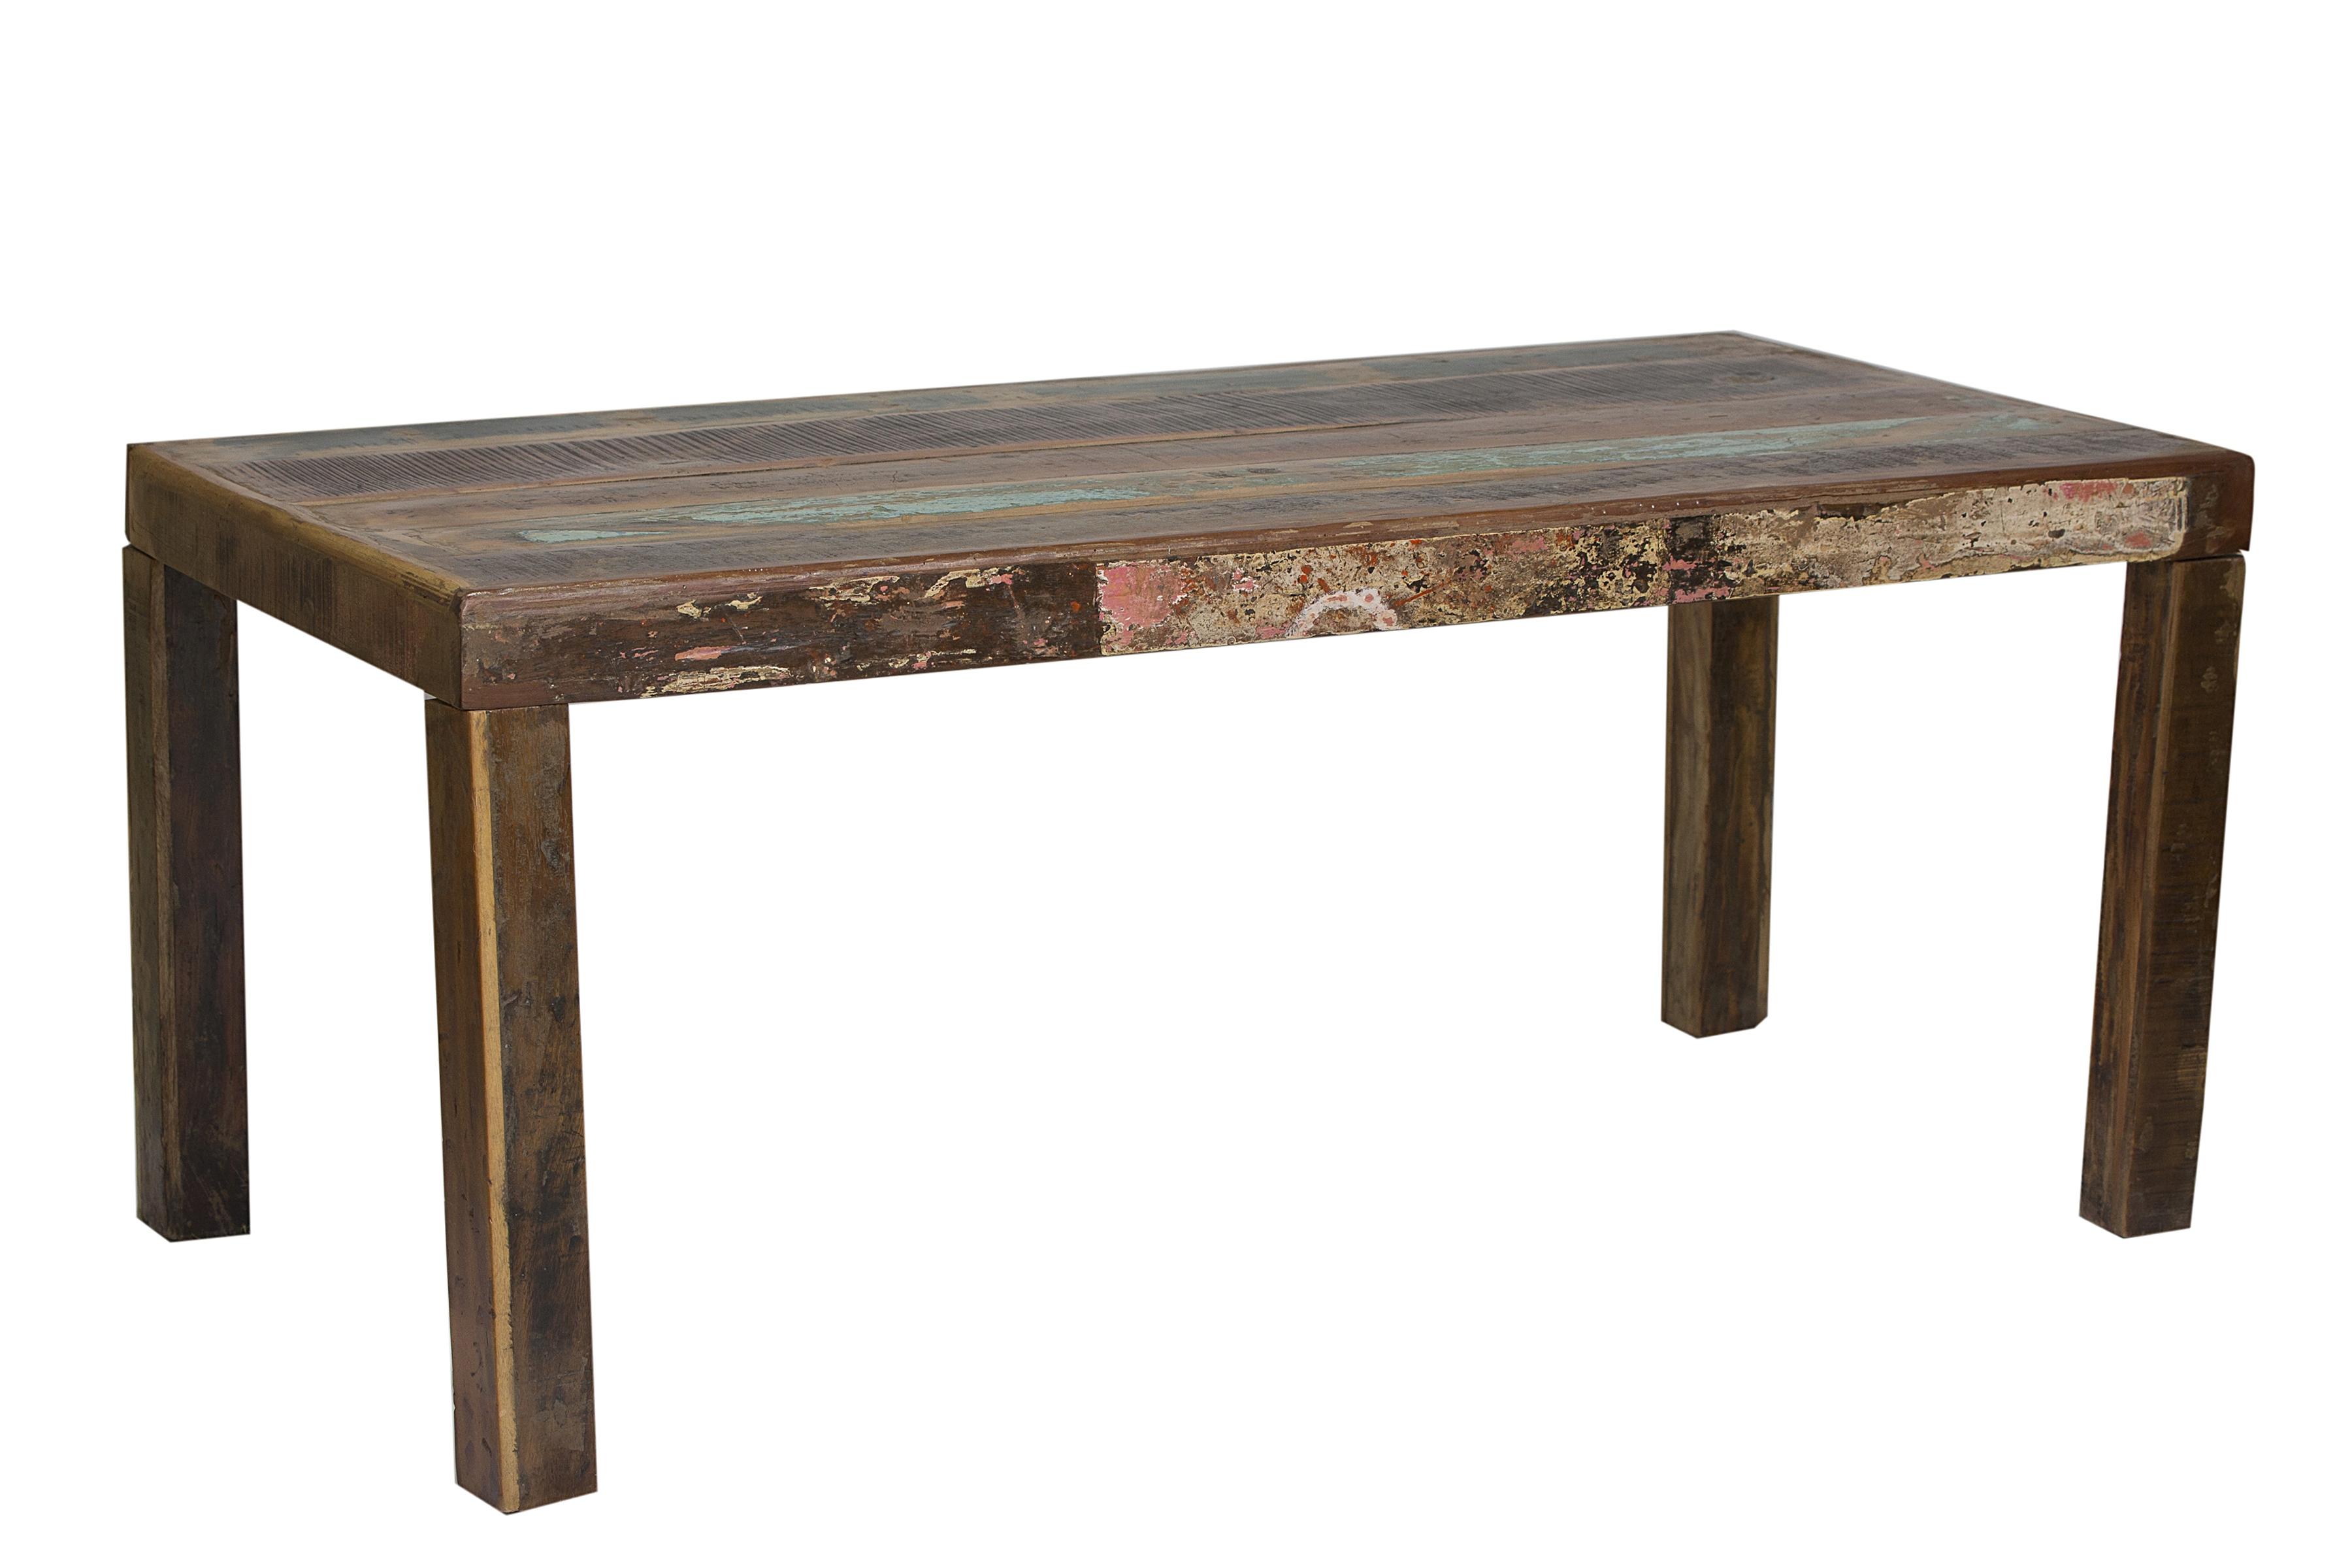 Sit Fridge Esstisch aus buntem Altholz 180x90